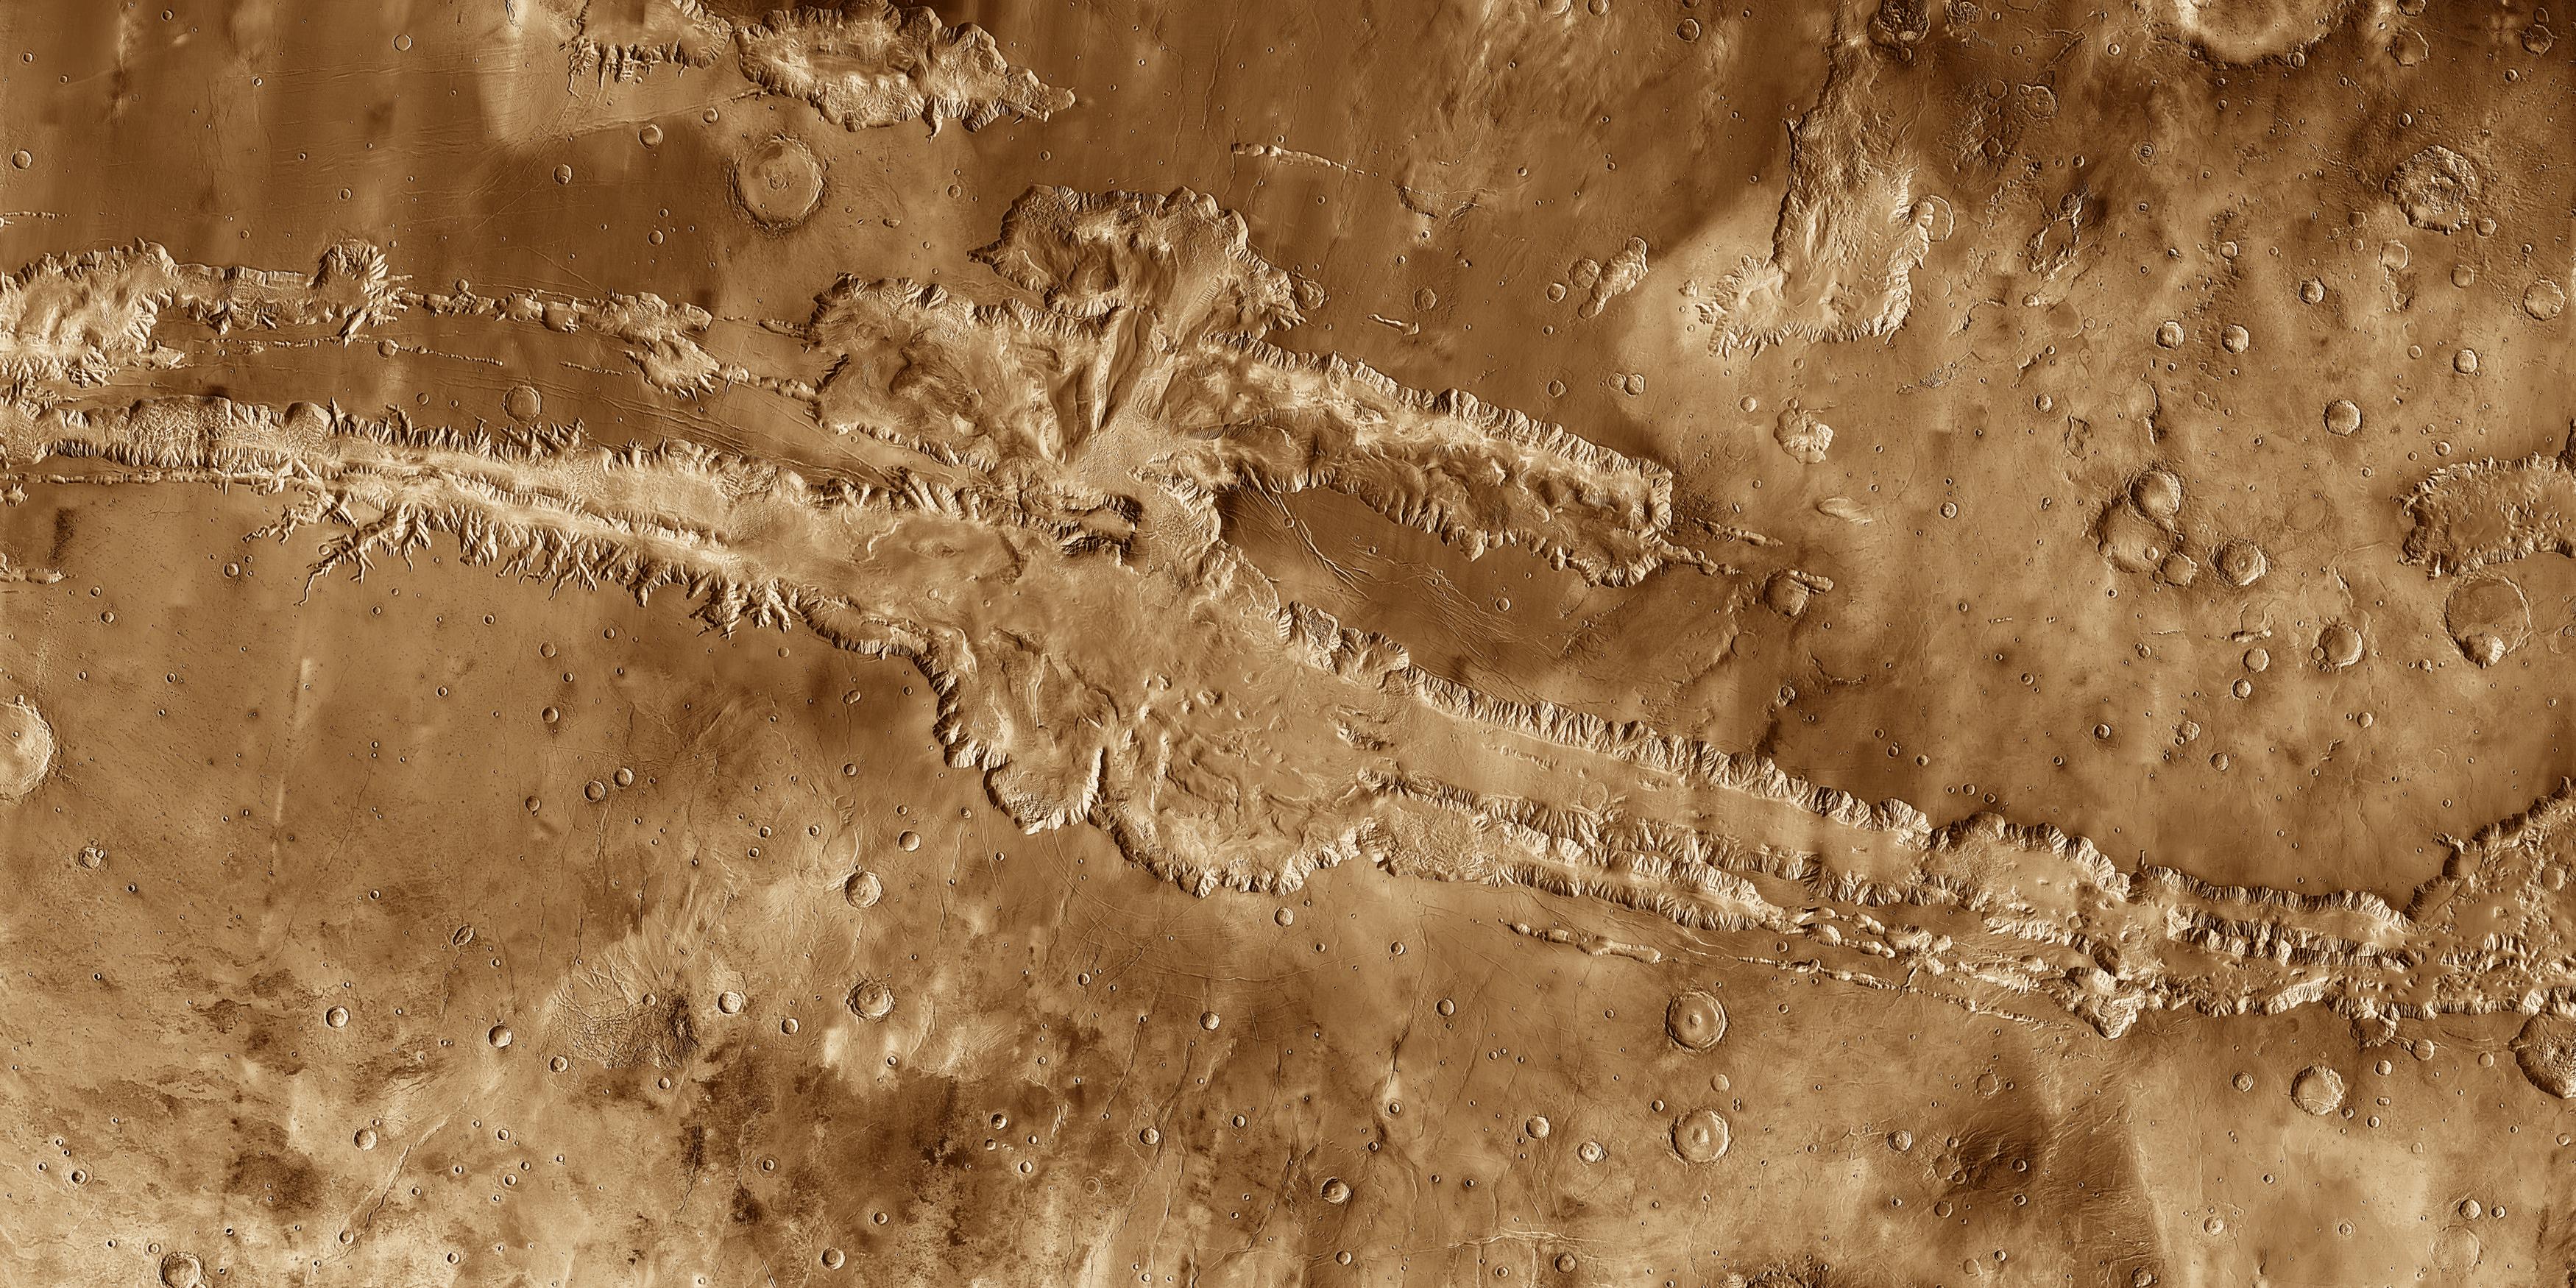 mars canyon nasa - photo #15